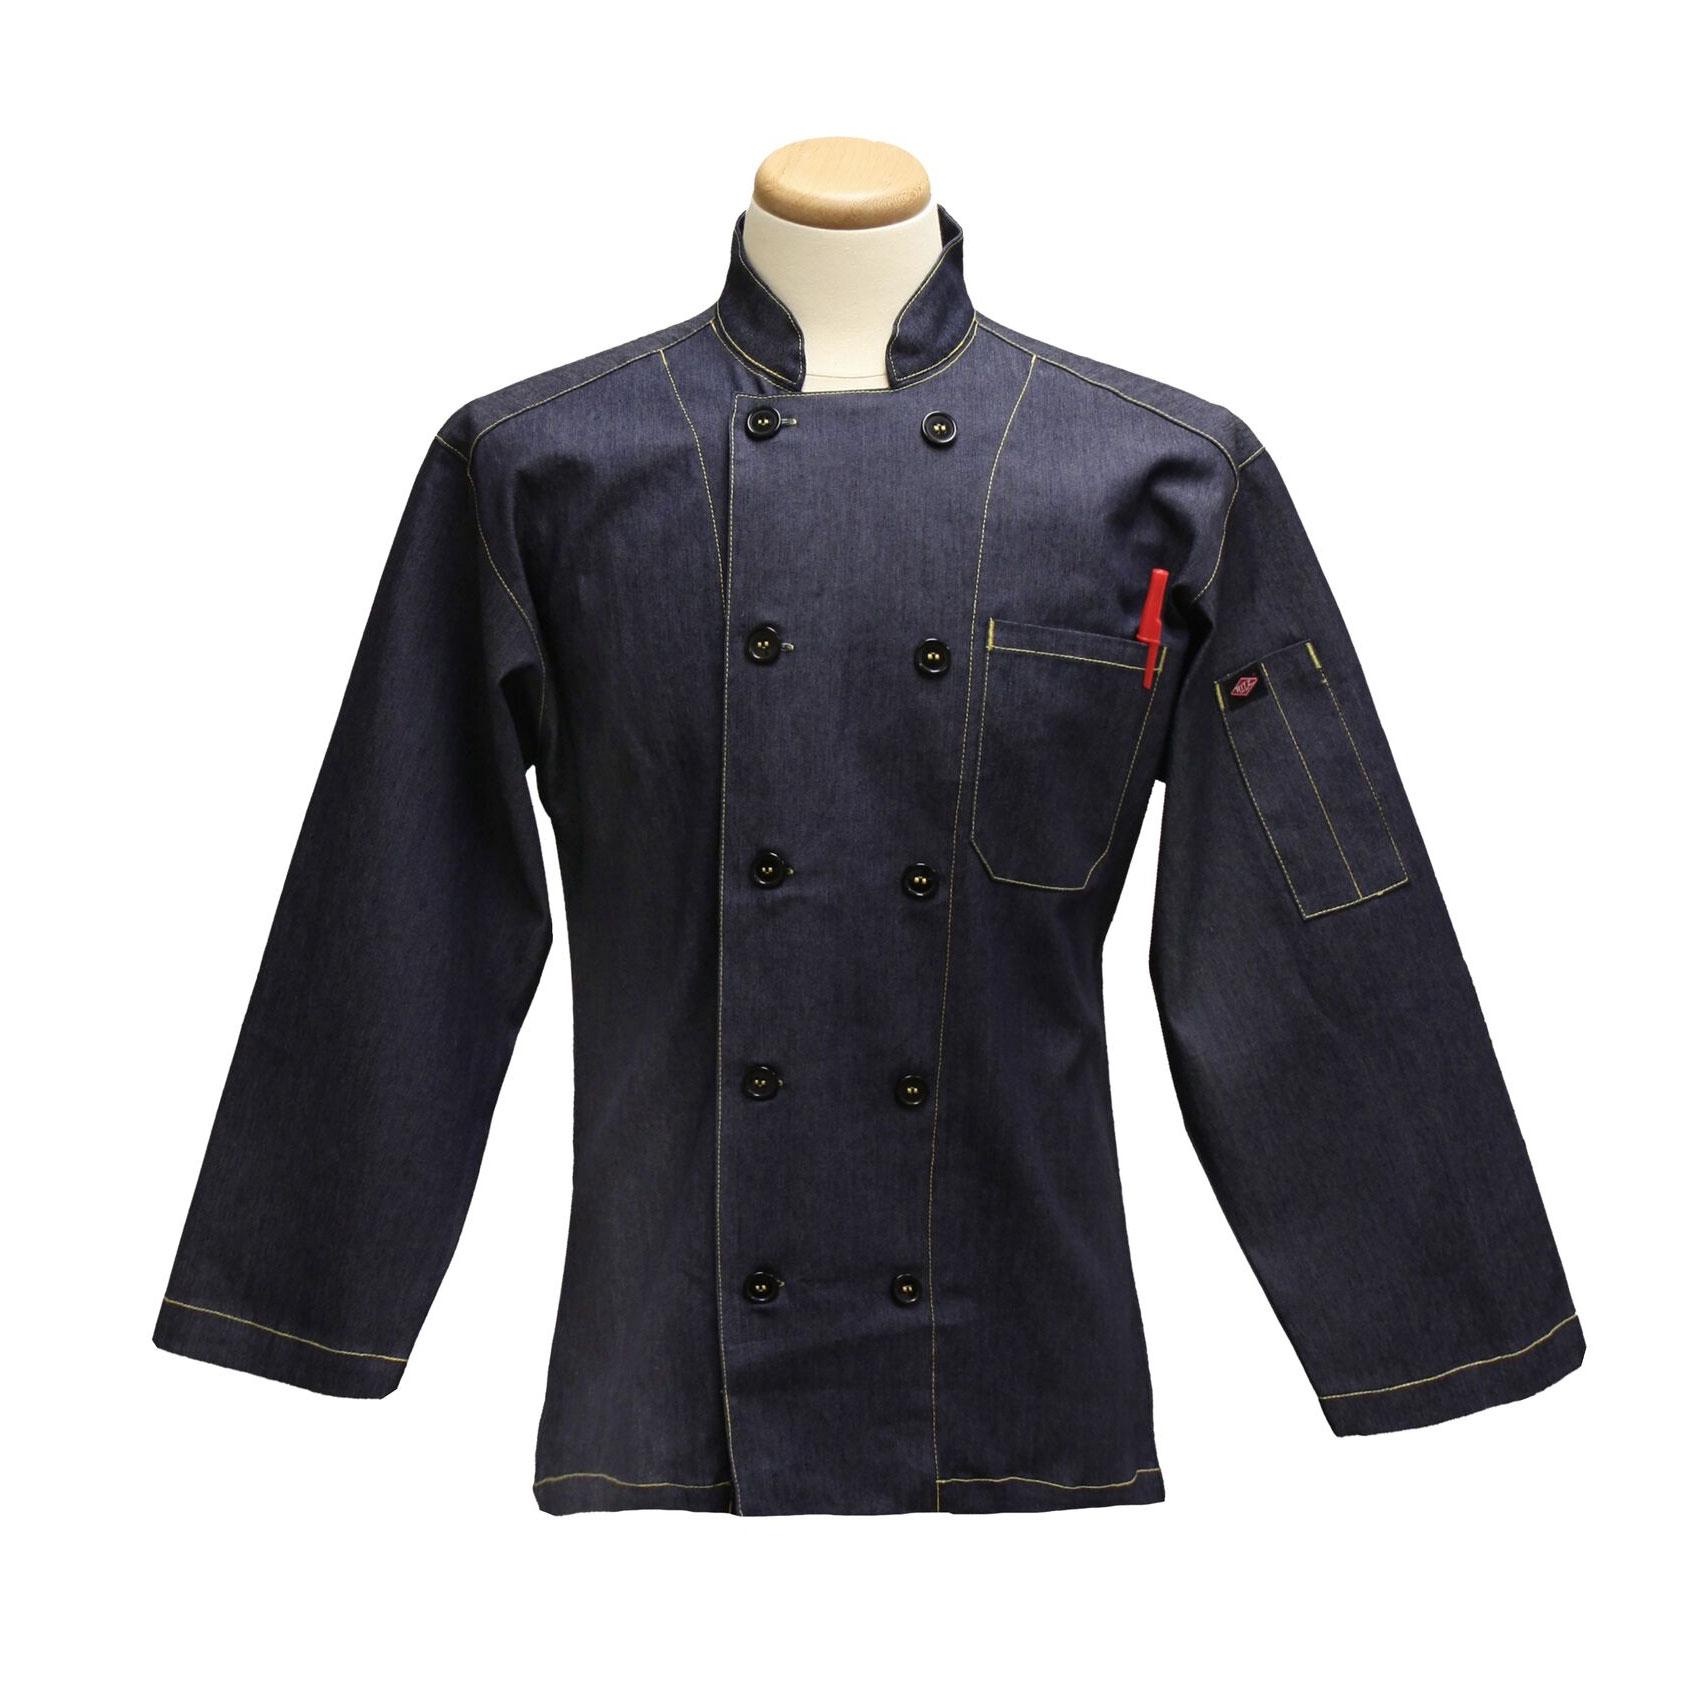 John Ritzenthaler Company RZDCOAT1X chef's coat